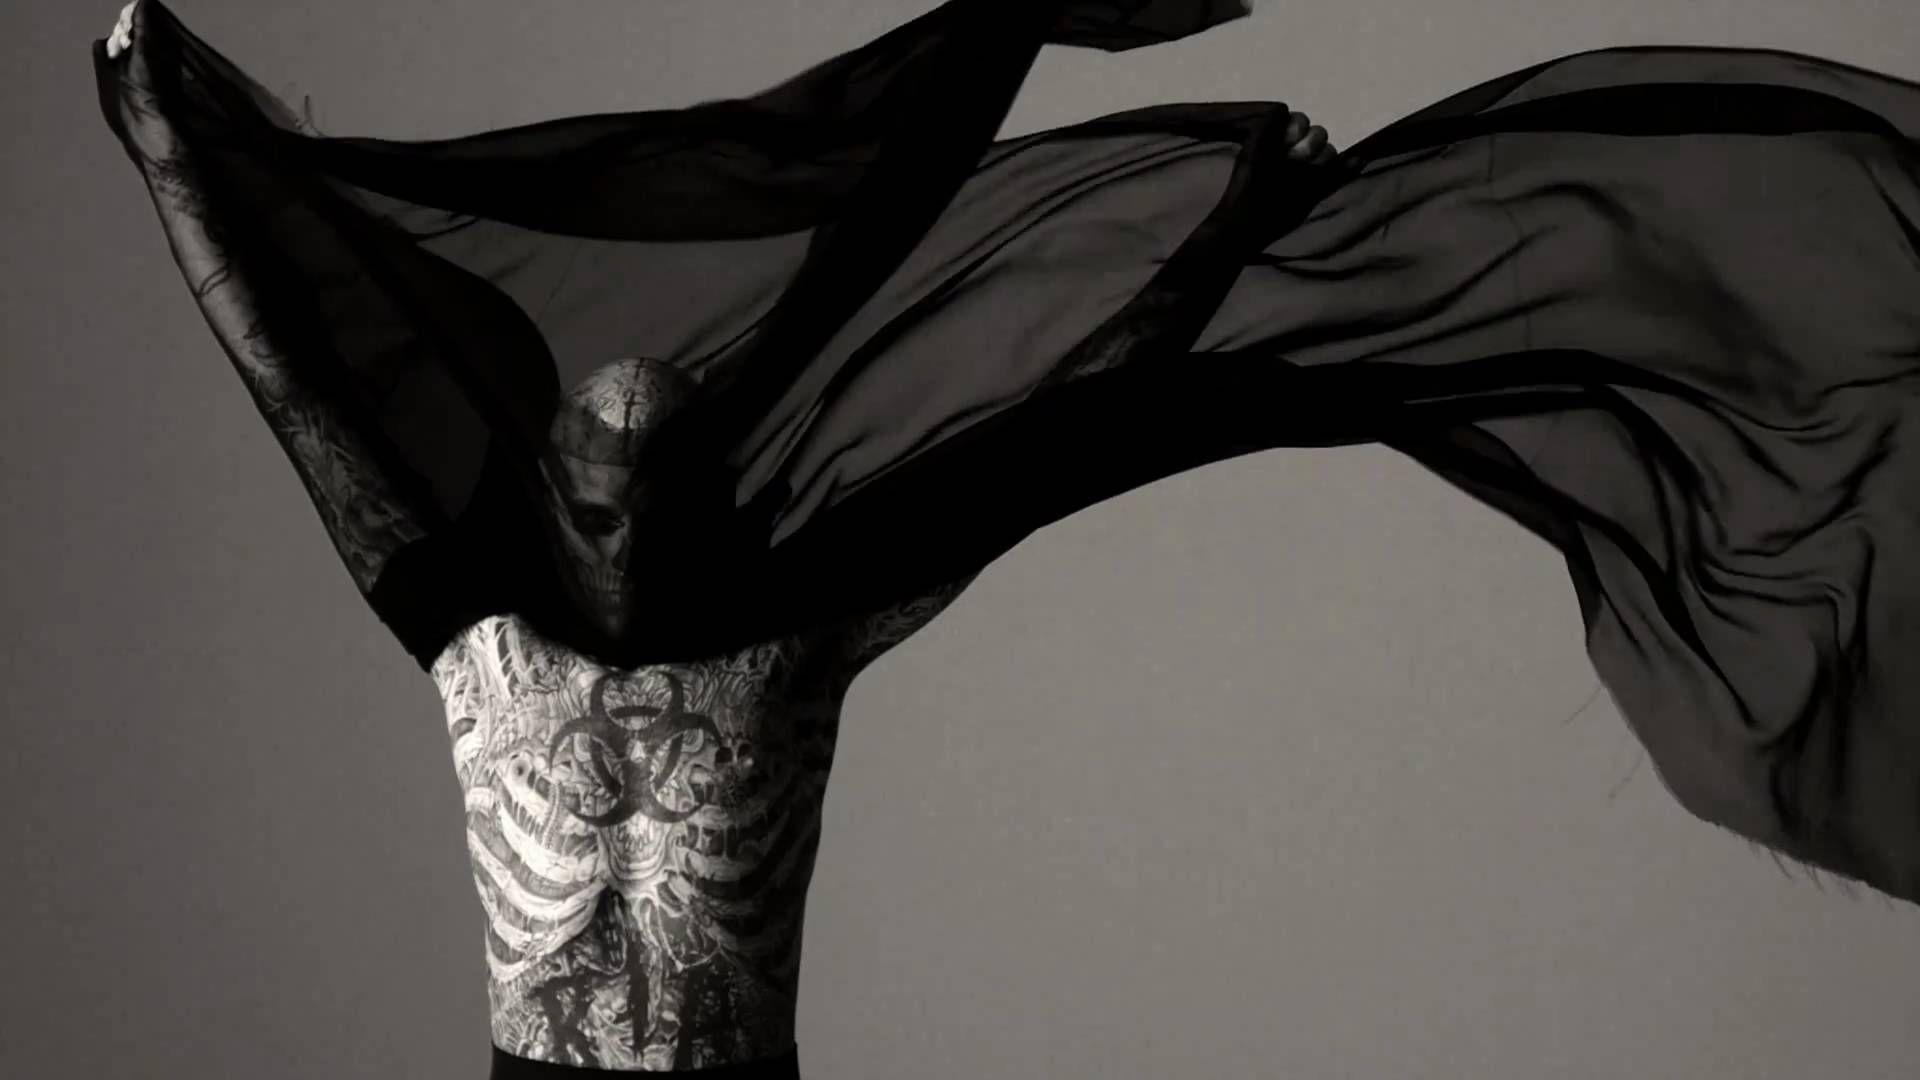 Anatomy of Change | Fashion | Pinterest | Anatomy, Rick genest and ...